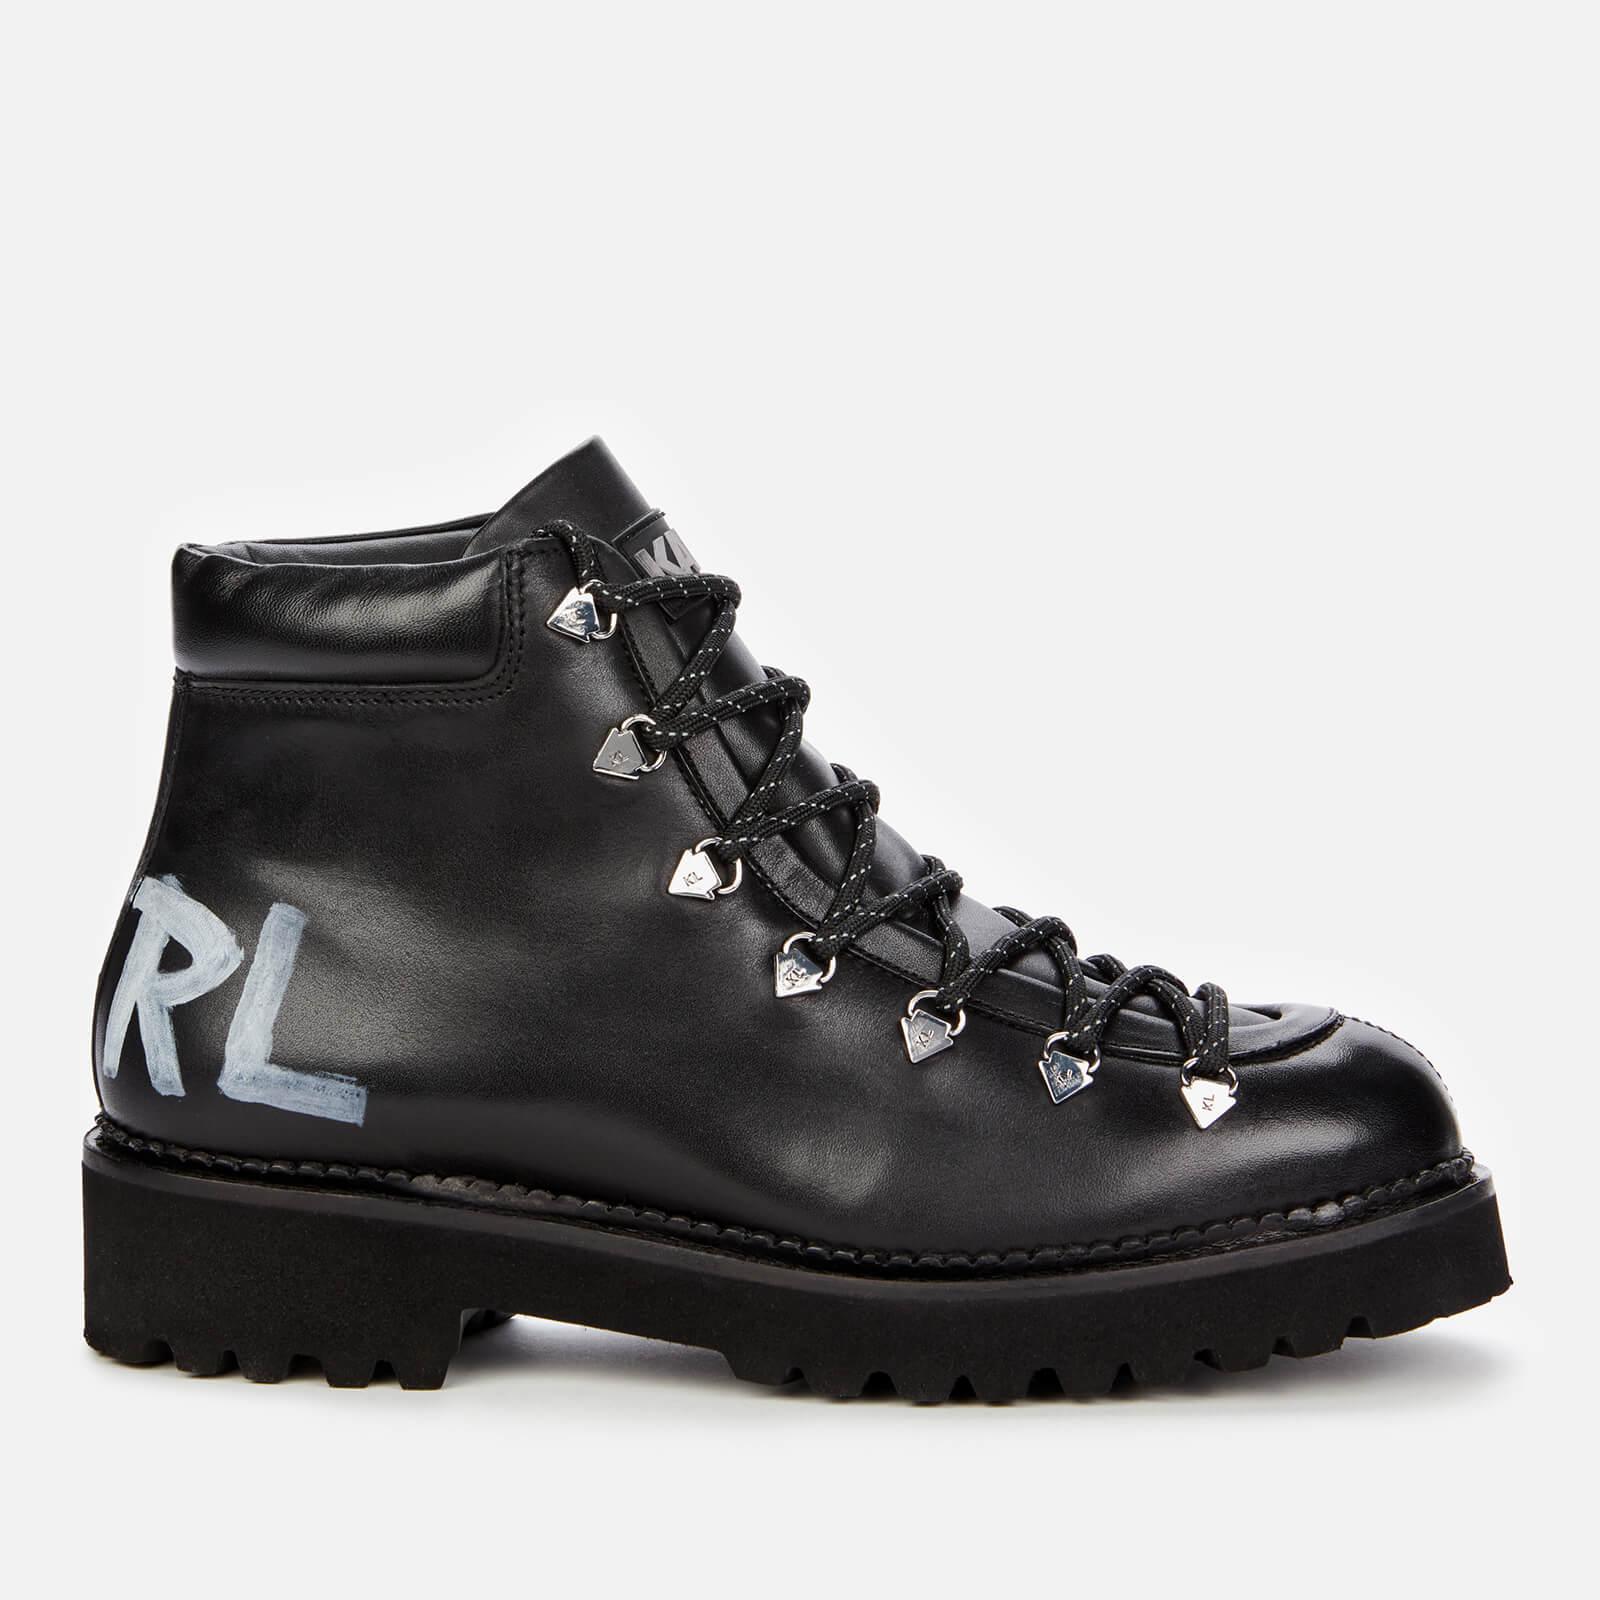 Karl Lagerfeld Women's Kadet Ii Leather Hiking Style Boots - Black - Uk 3